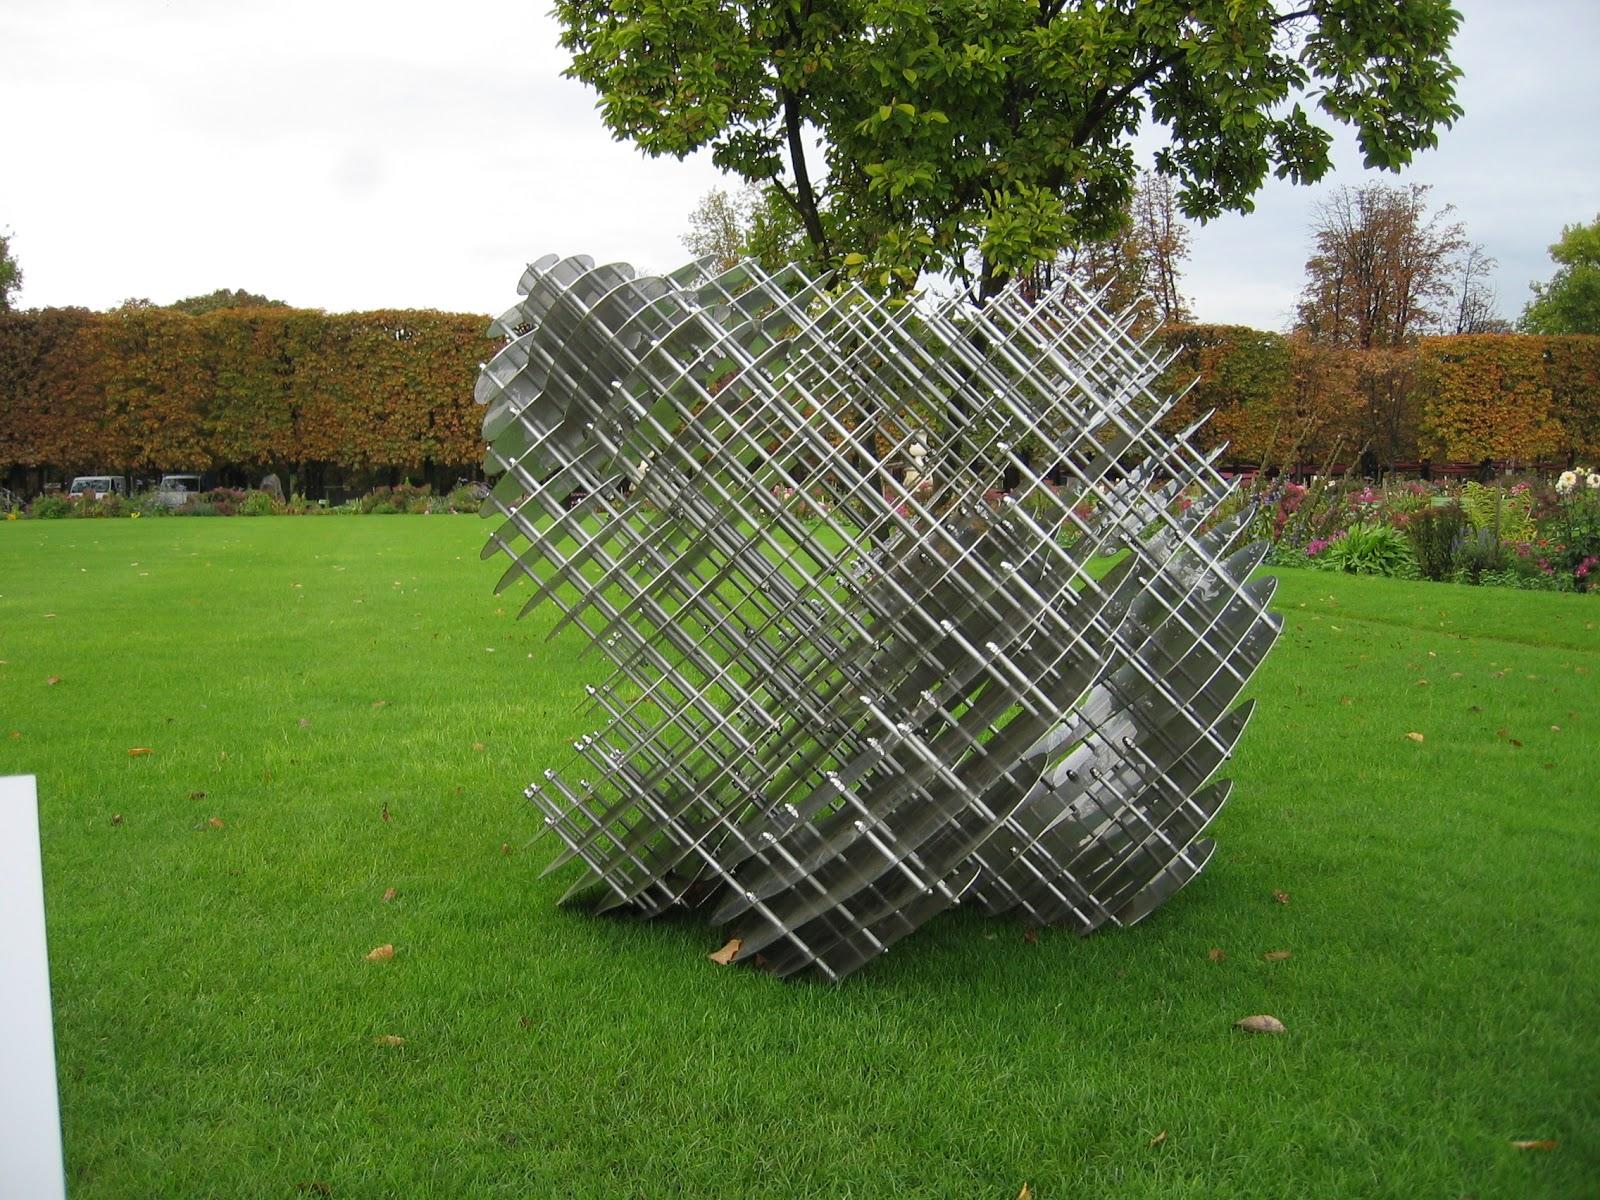 Entrevoir fiac 2012 jardin des tuileries for Fiac 2015 jardin des tuileries